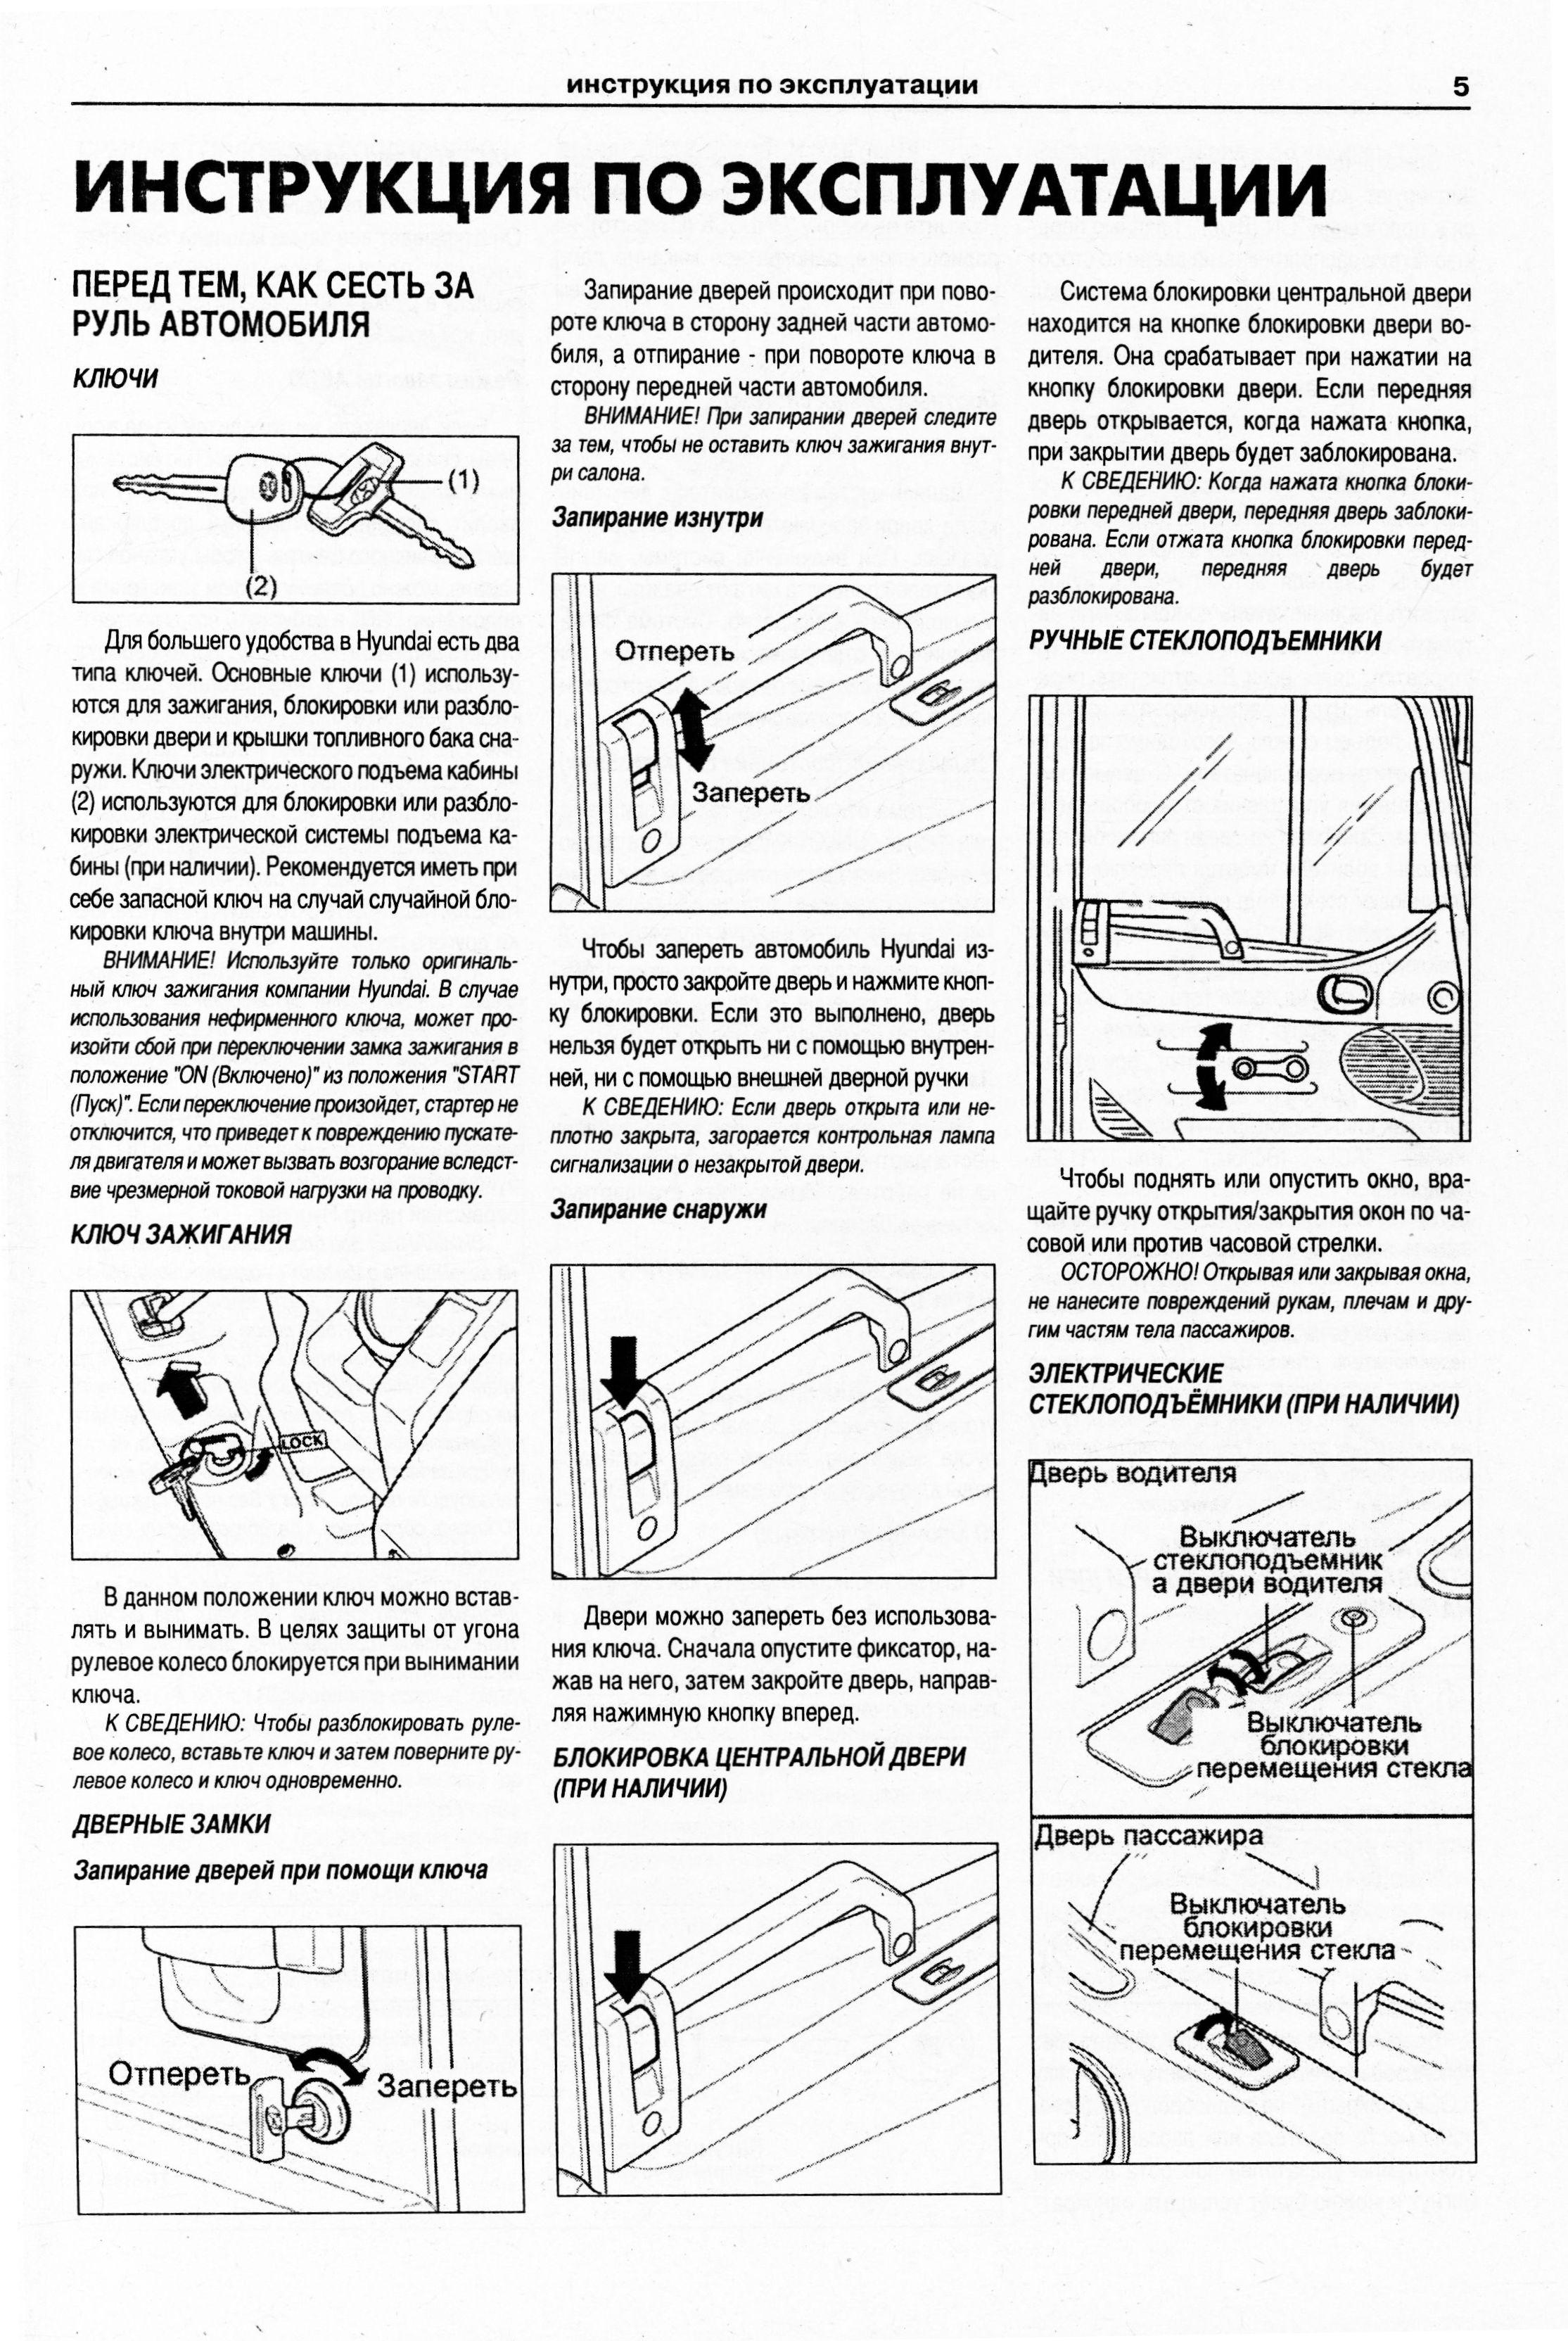 инструкция эксплуатации хундай санта